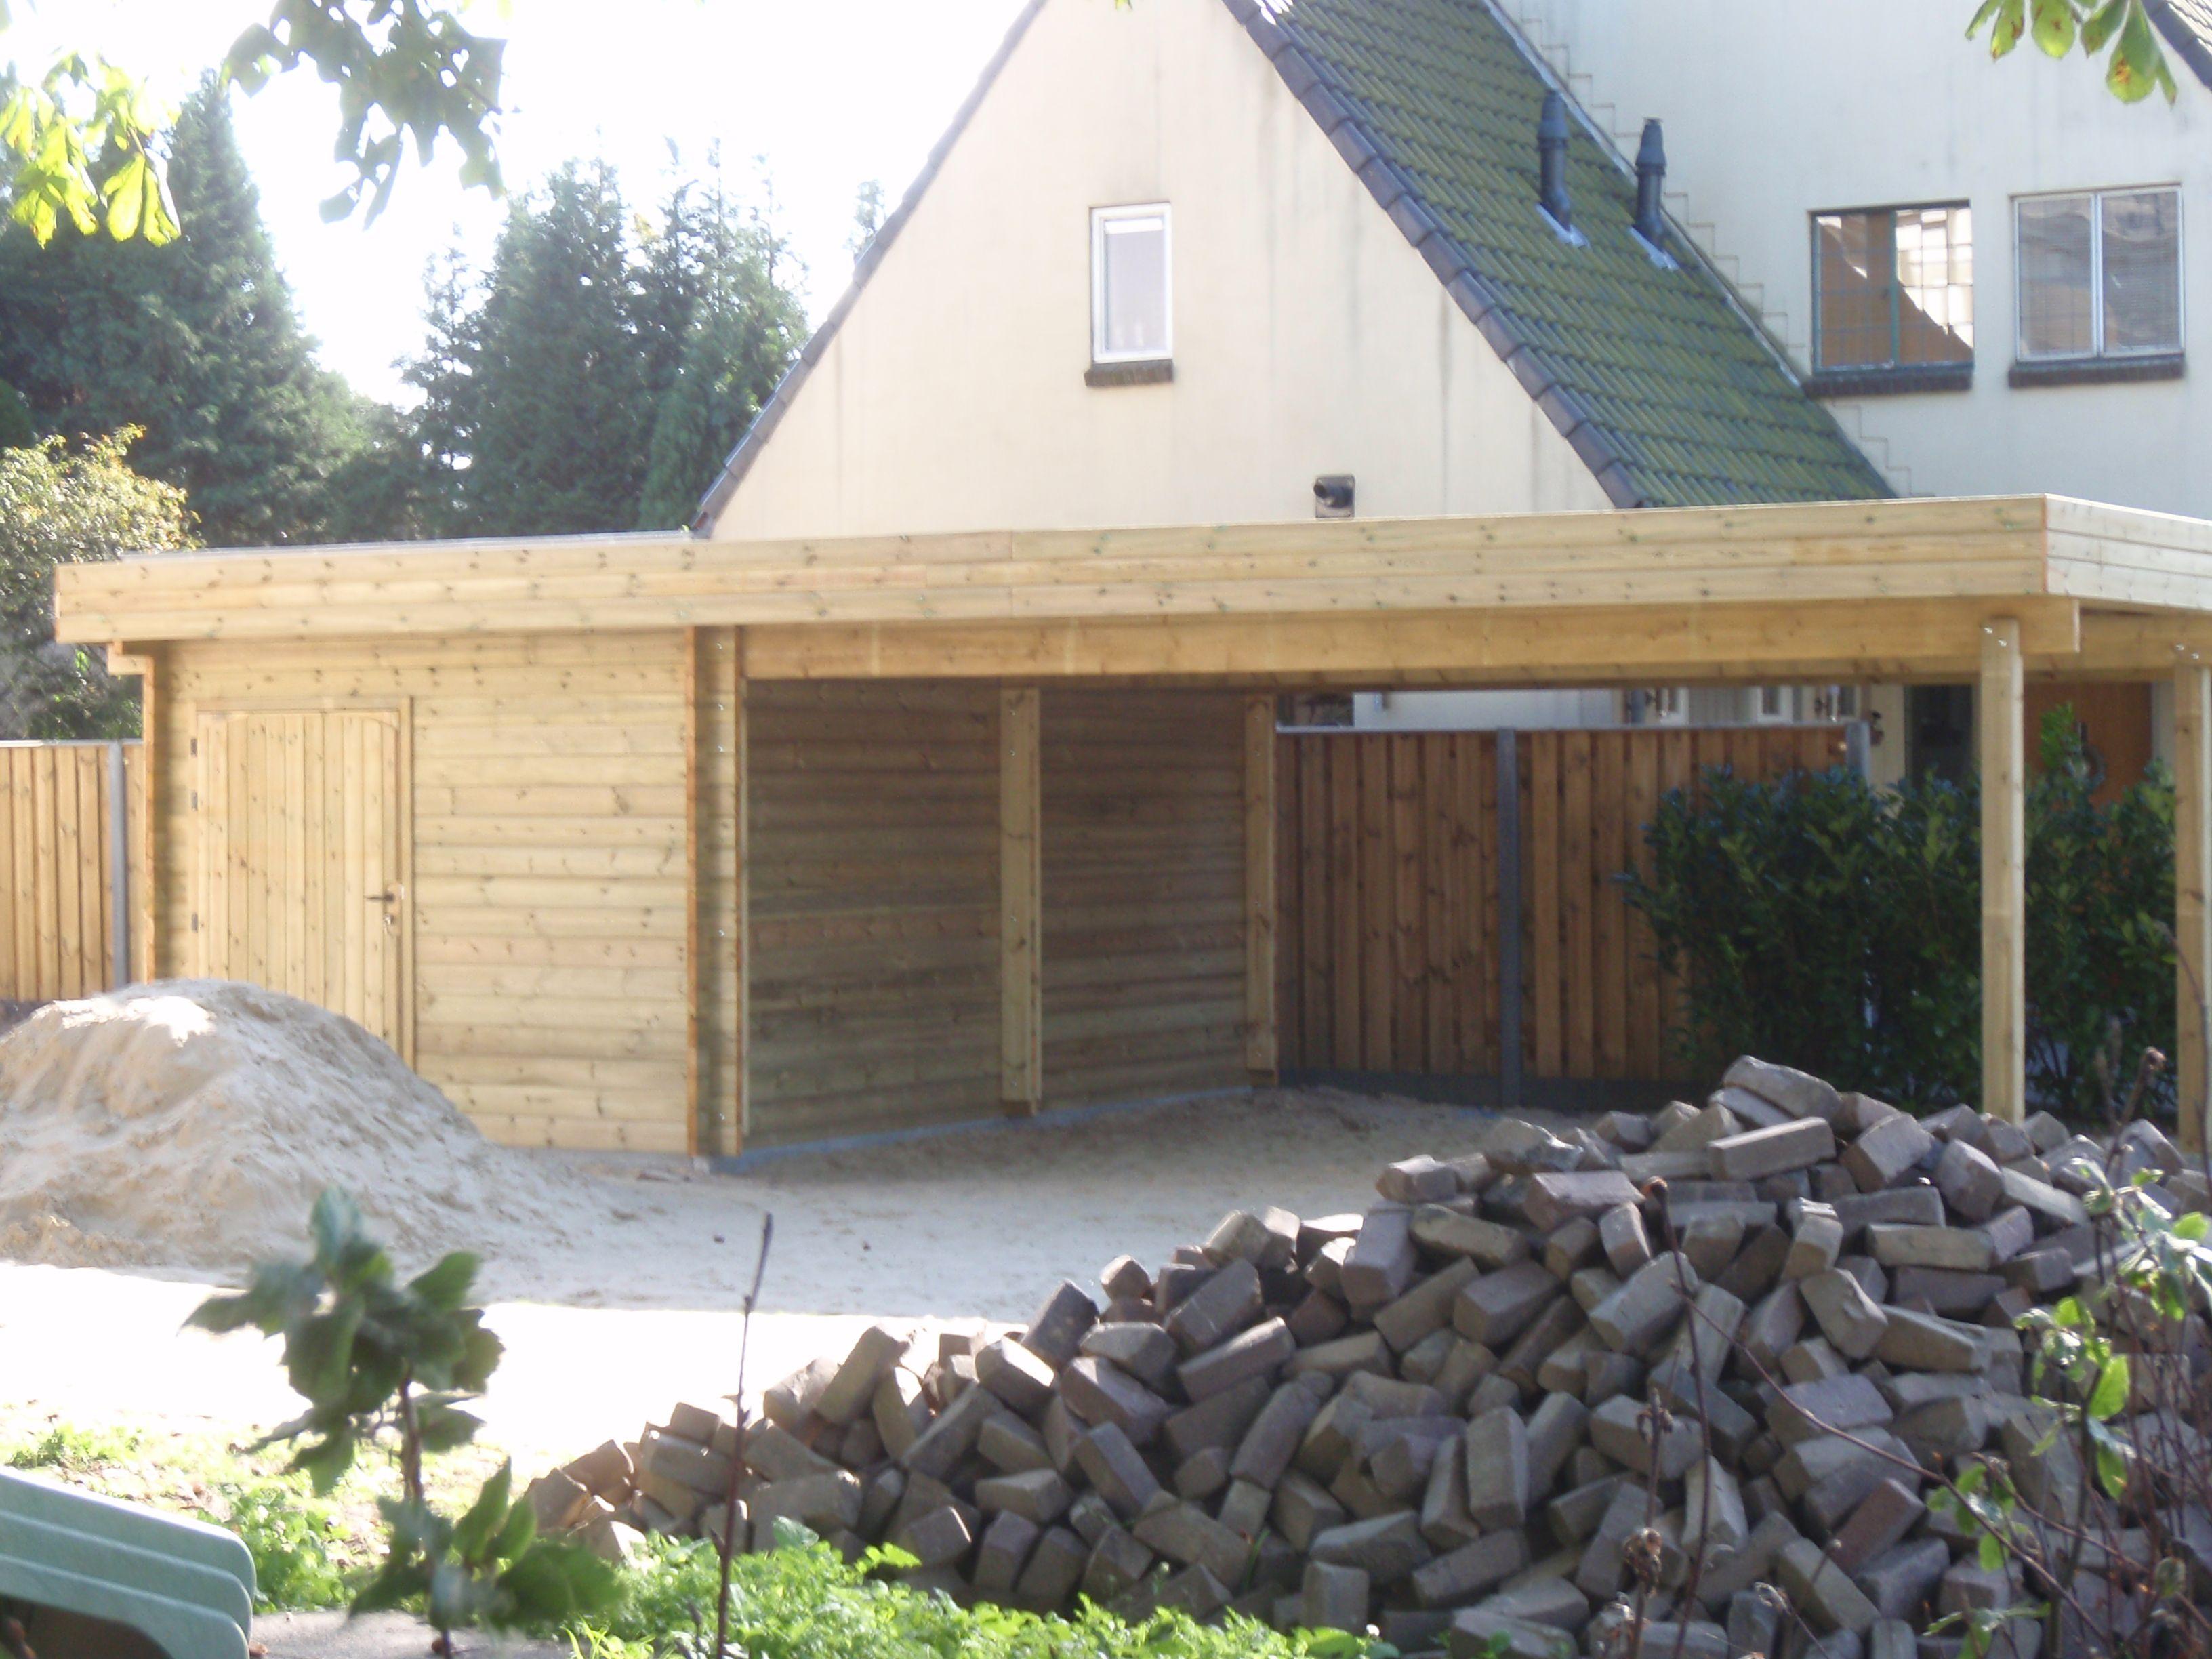 blokhut, tuinhuis, met carport/overkapping, tuin, oprit, tuinmani ...